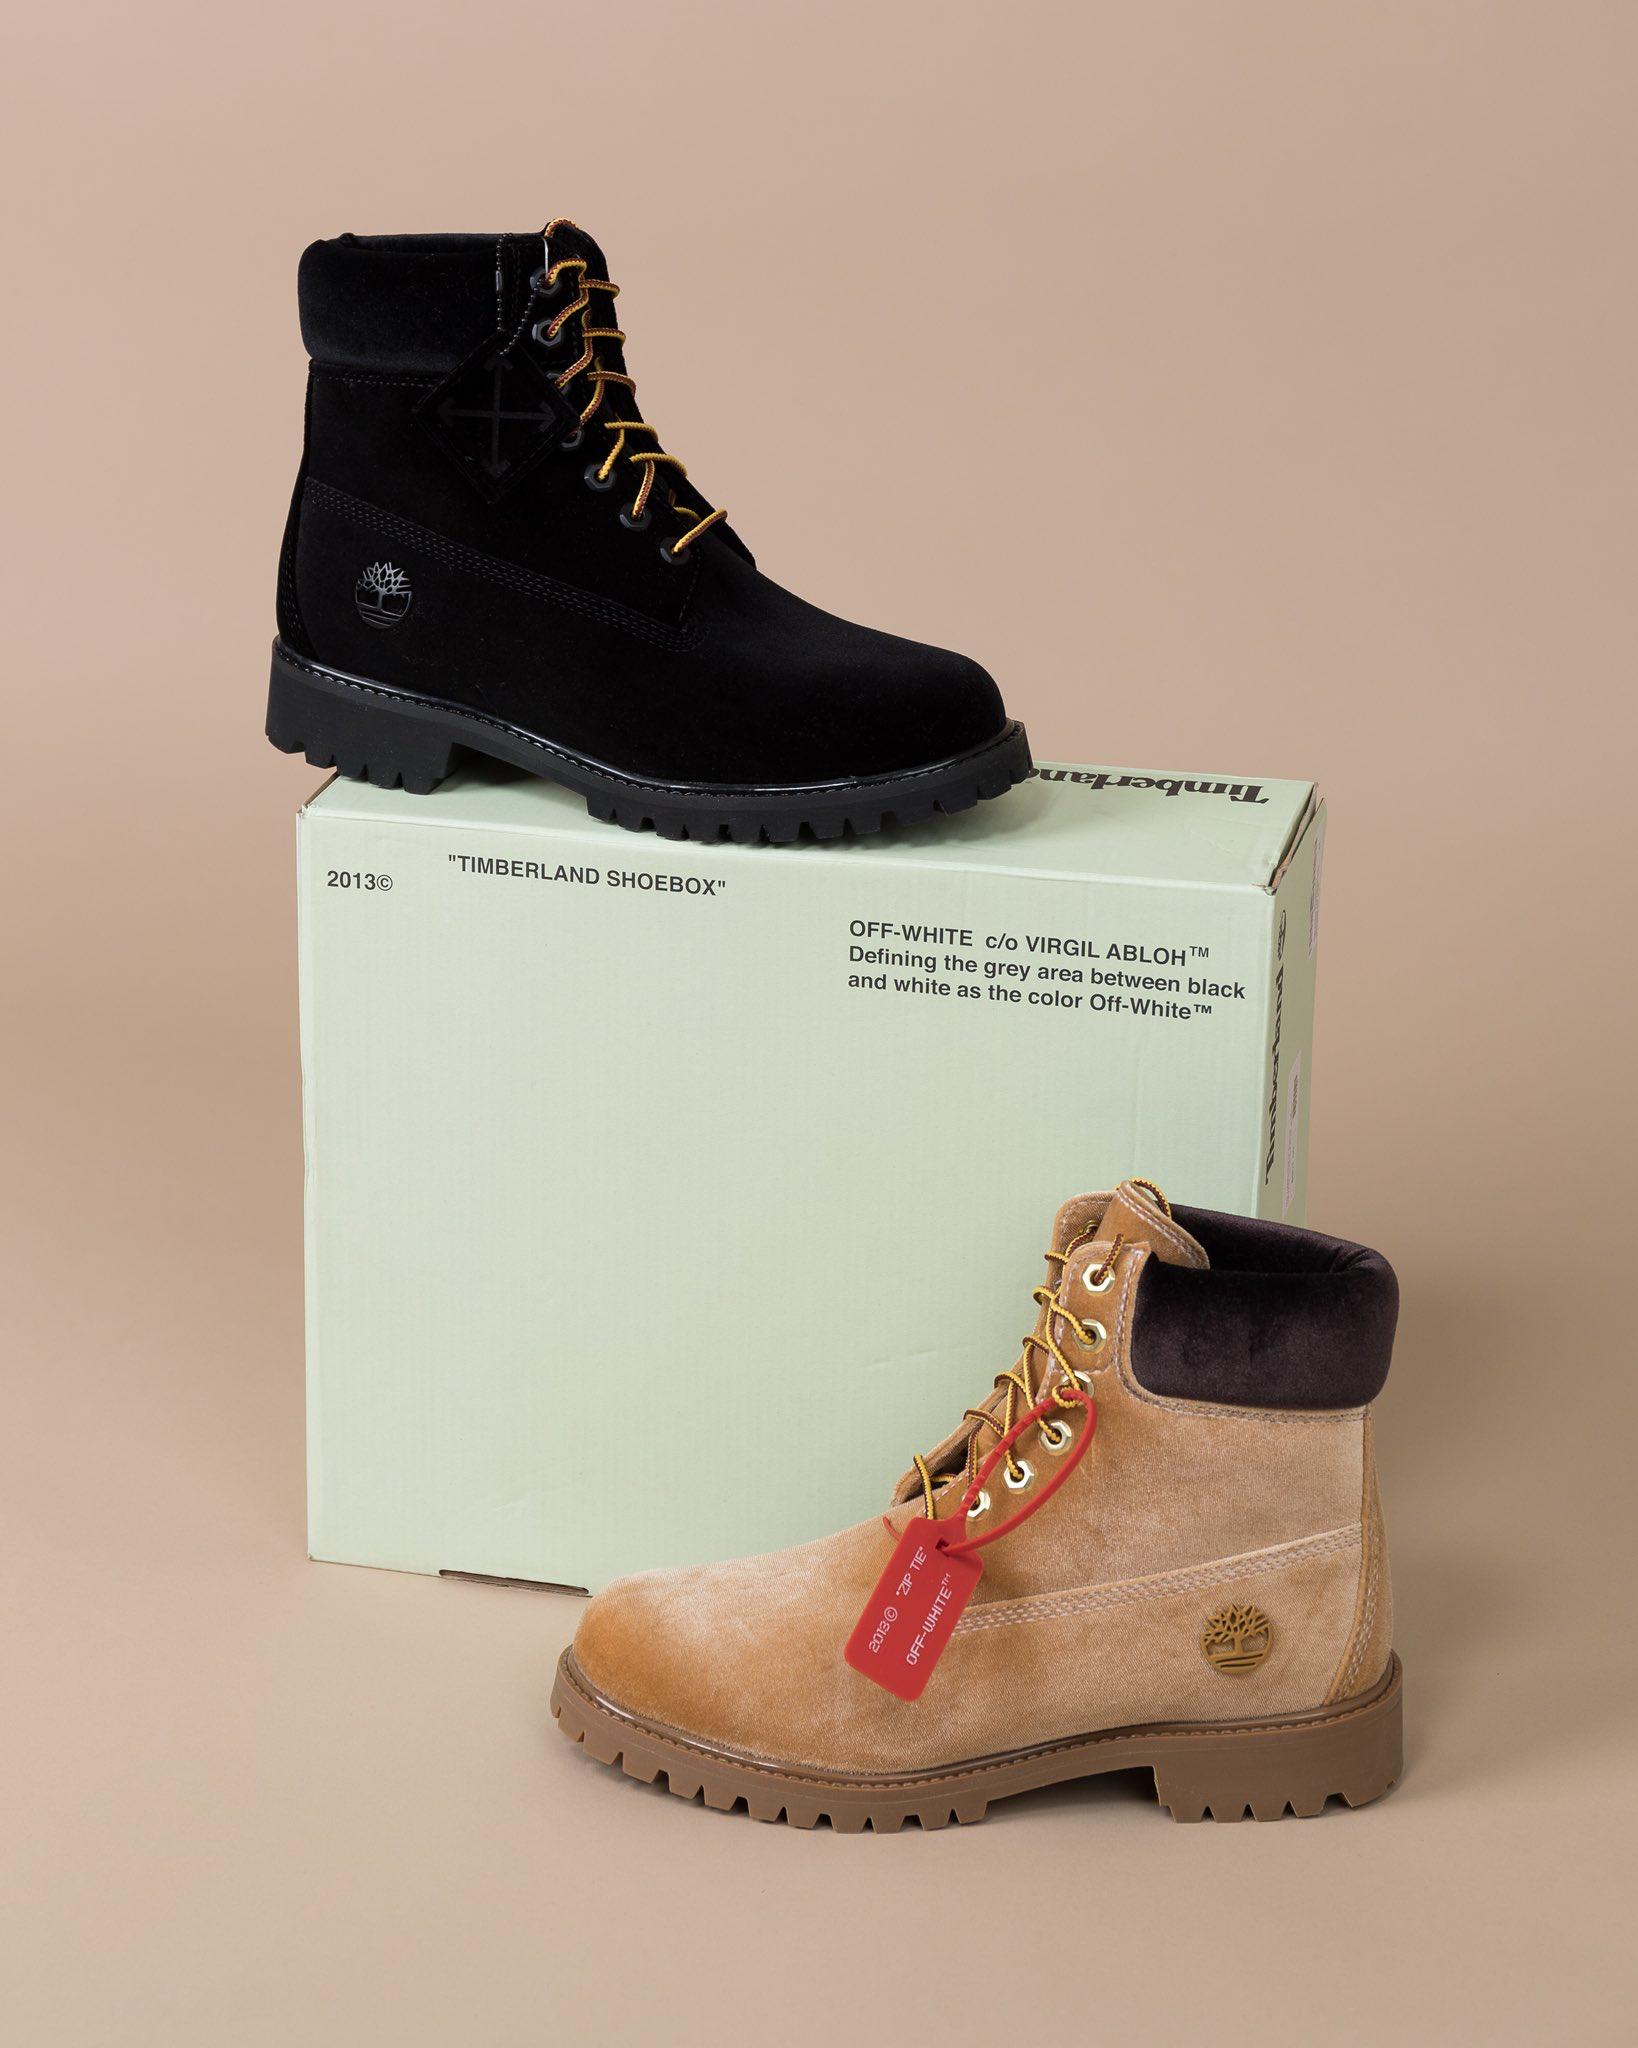 inch boot. Virgil Abloh reimagines